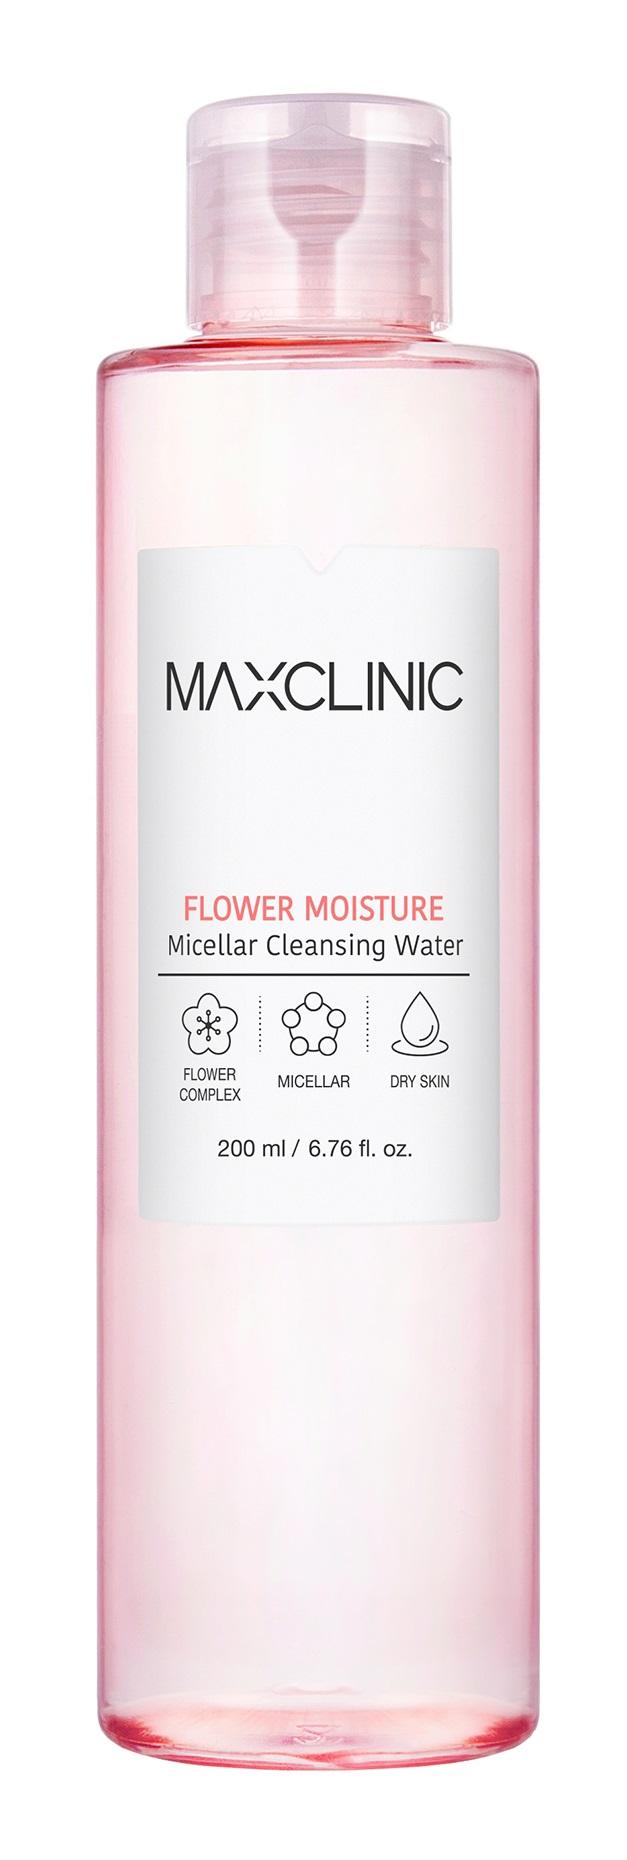 Мицеллярная вода Maxclinic Micellar Cleansing Water Flower Moisture